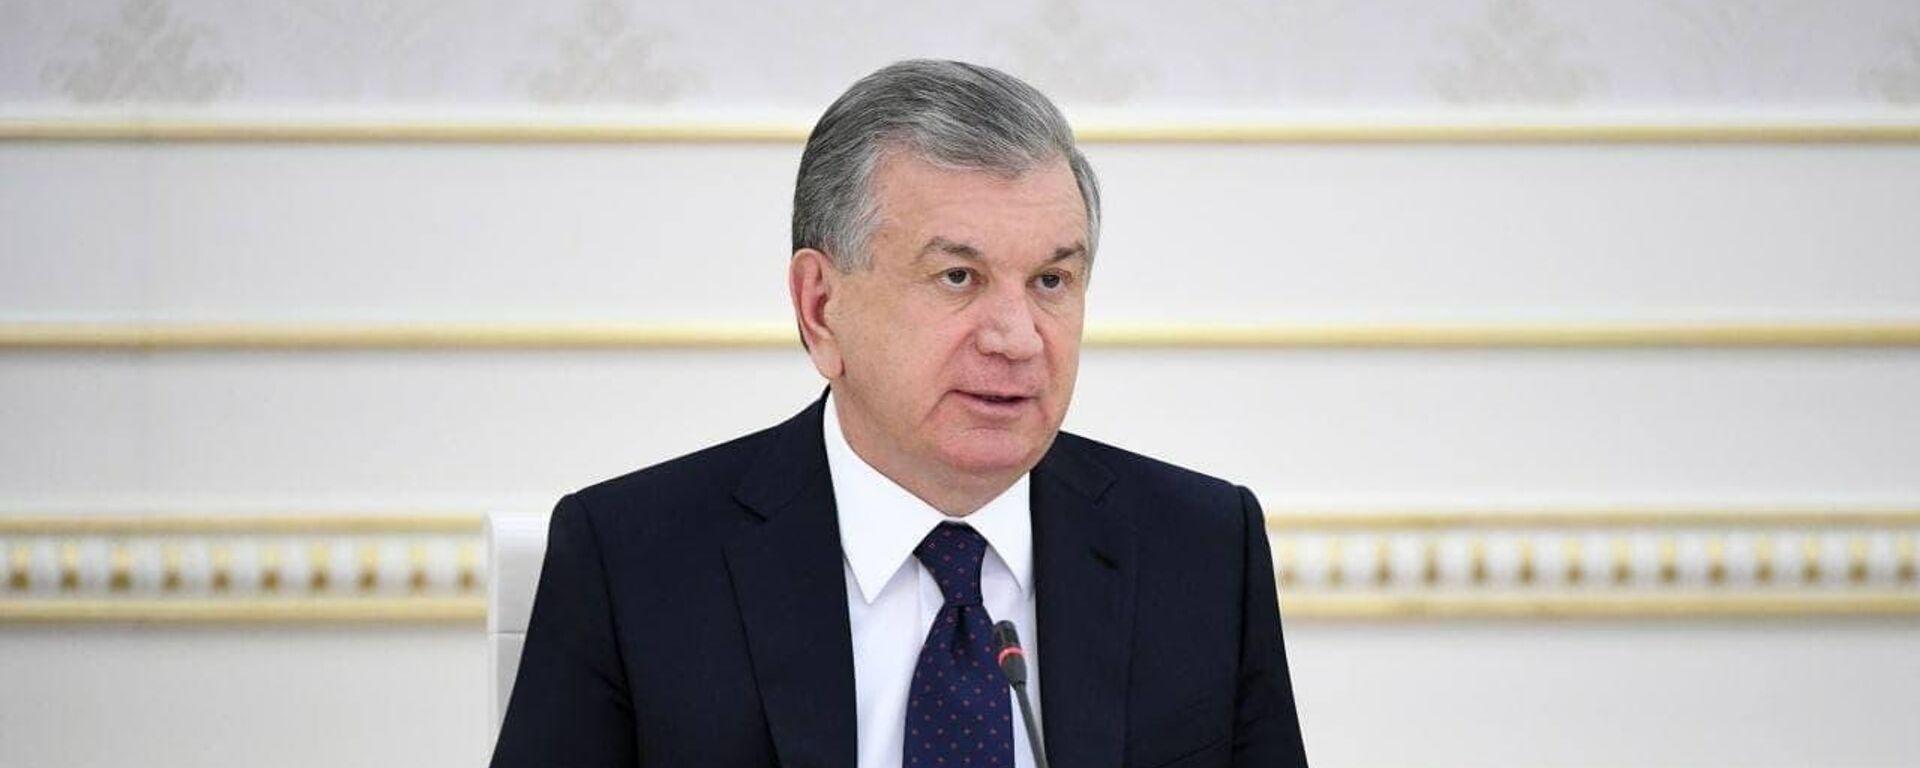 Президент Узбекистана Шавкат Мирзиёев - Sputnik Узбекистан, 1920, 25.06.2021